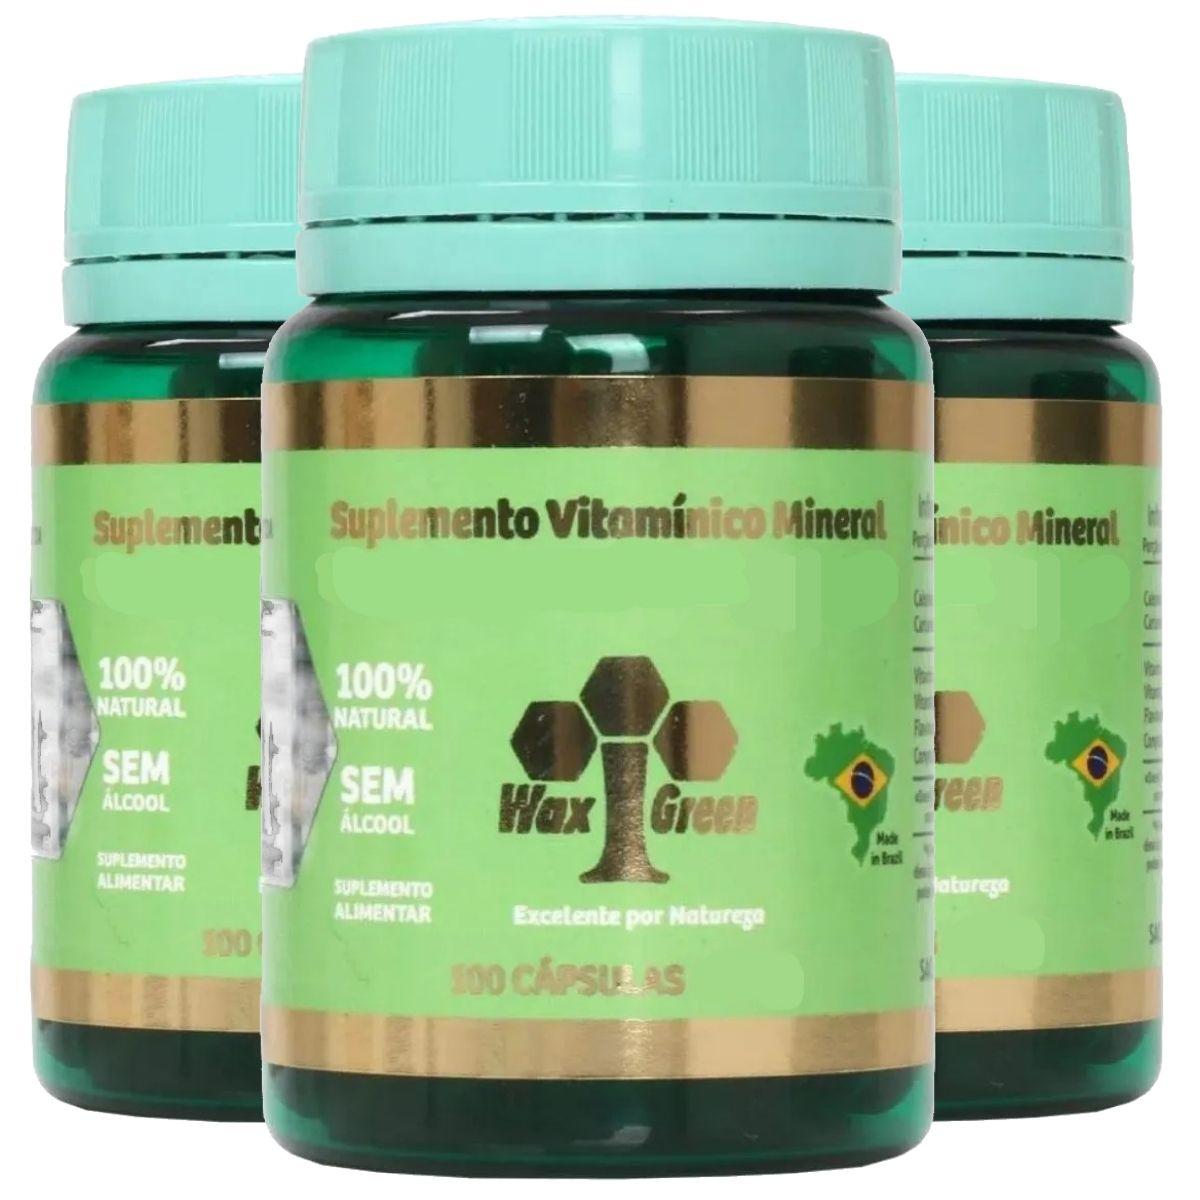 Kit 3 Própolis Verde 80% + Ômega 3 100 cápsulas 300mg - Wax Green